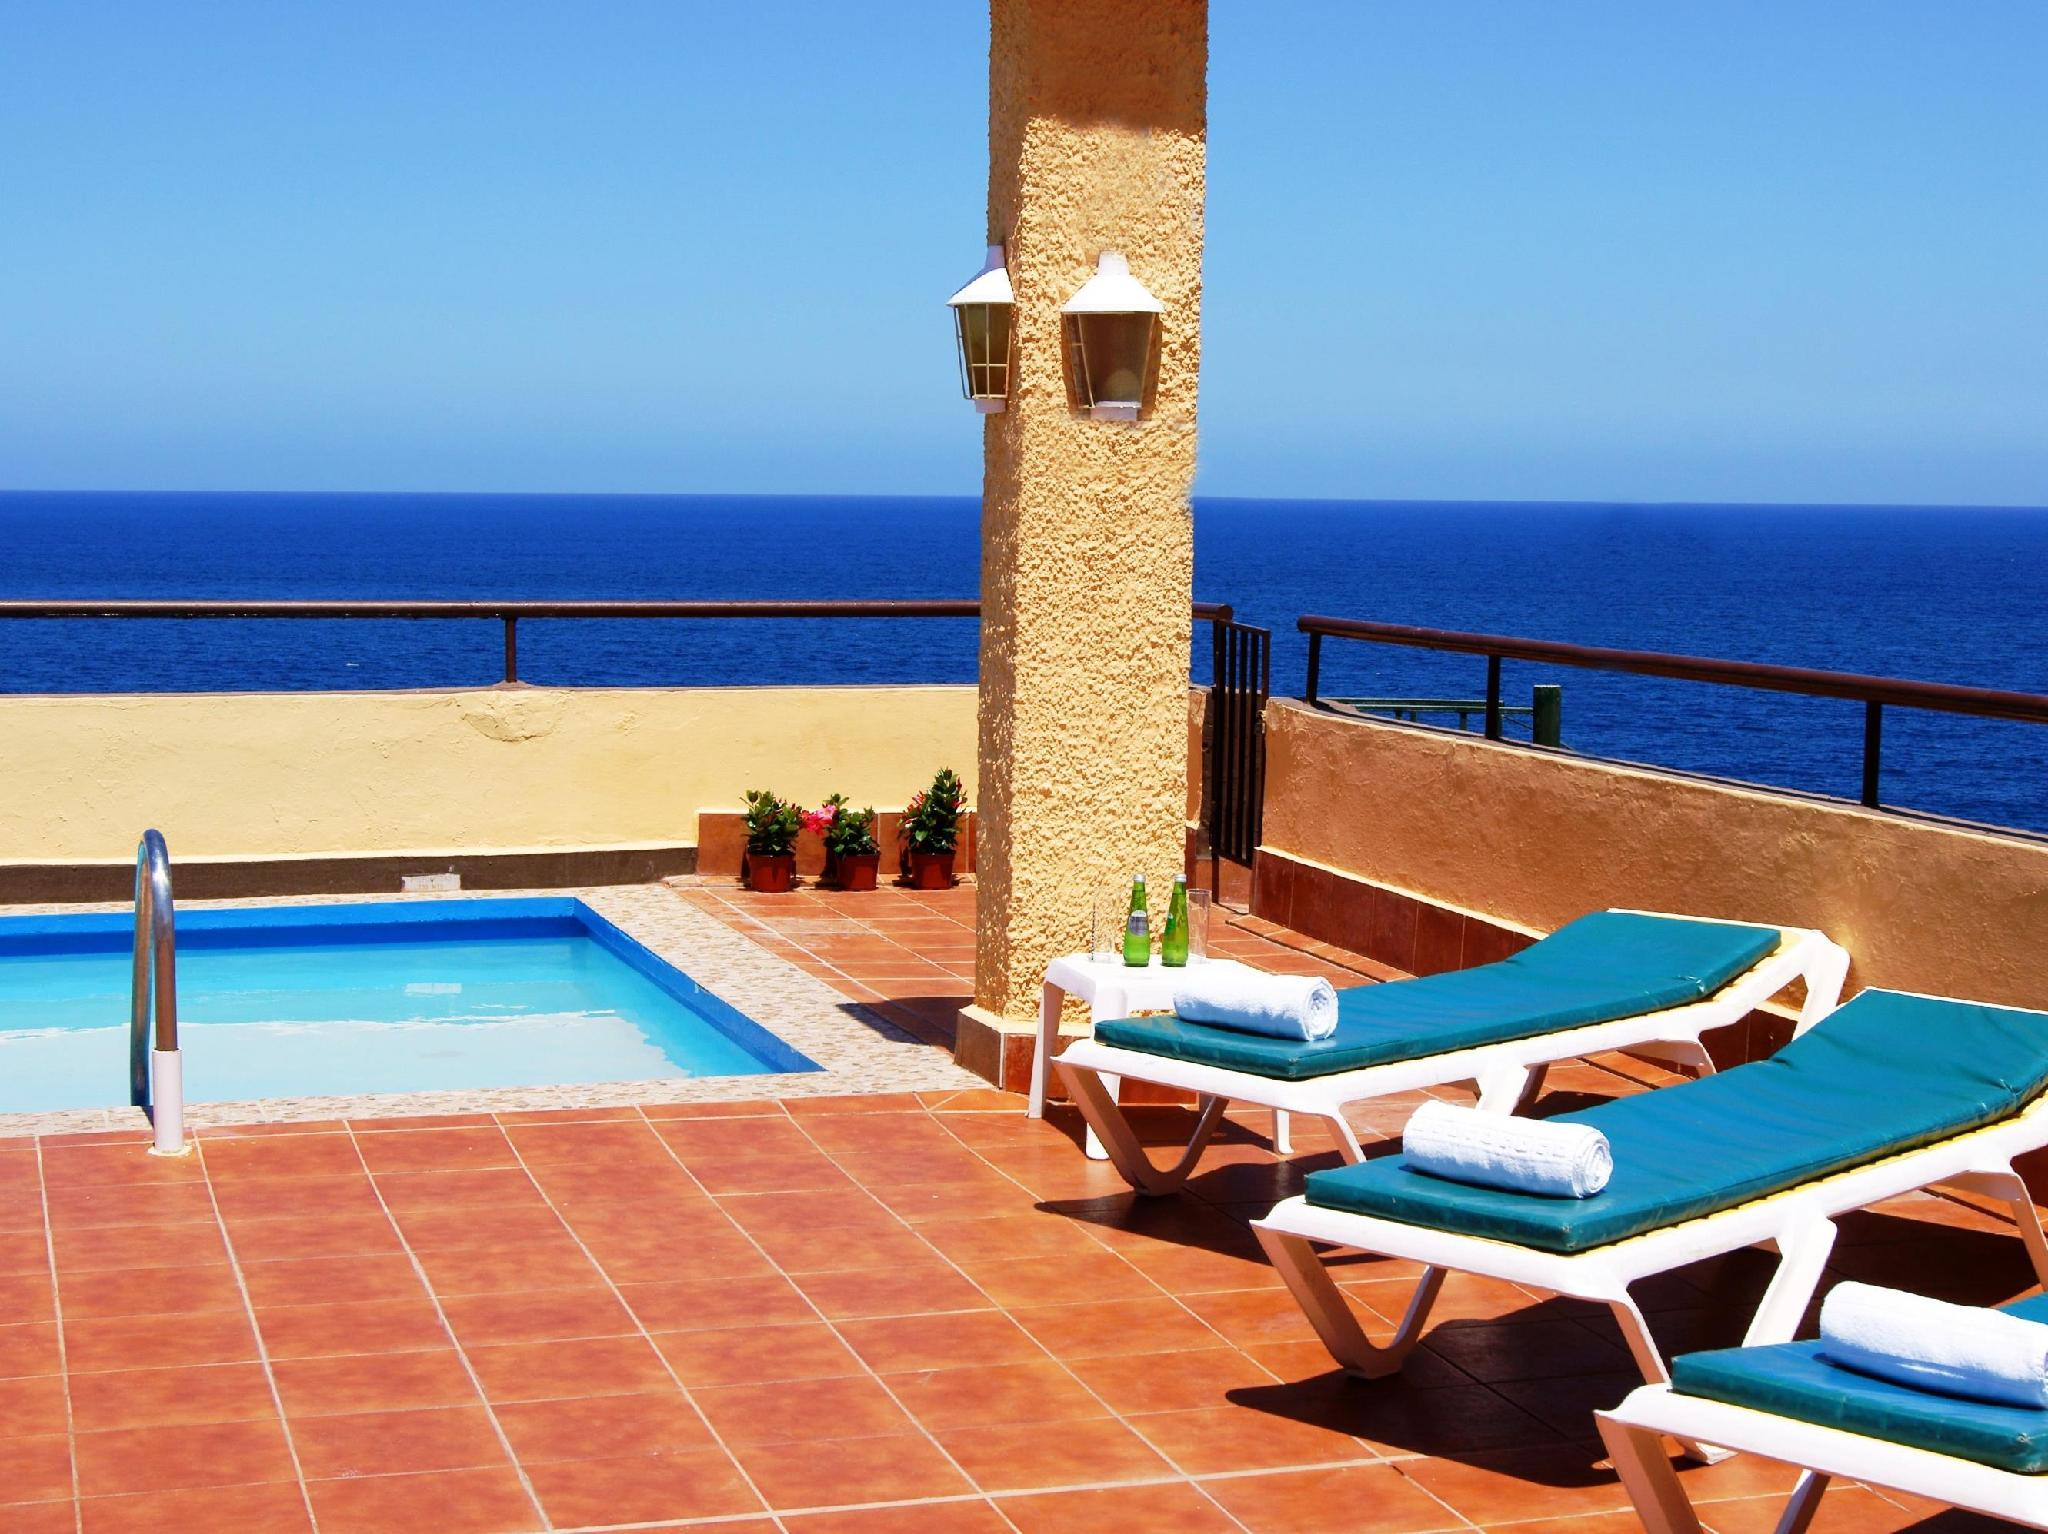 Hotel Marquesa - Tenerife